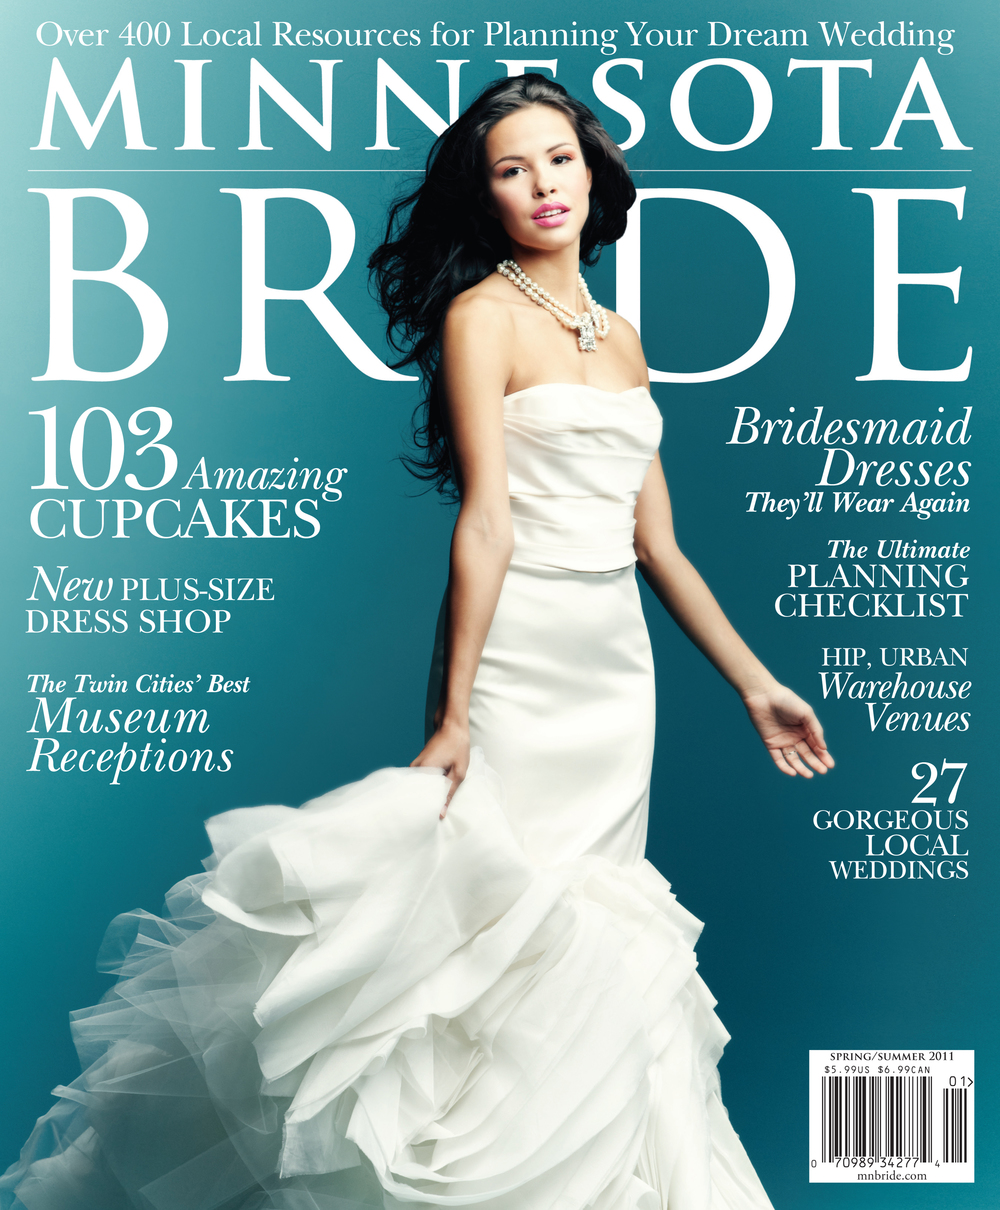 Minnesota Bride, Spring 2011